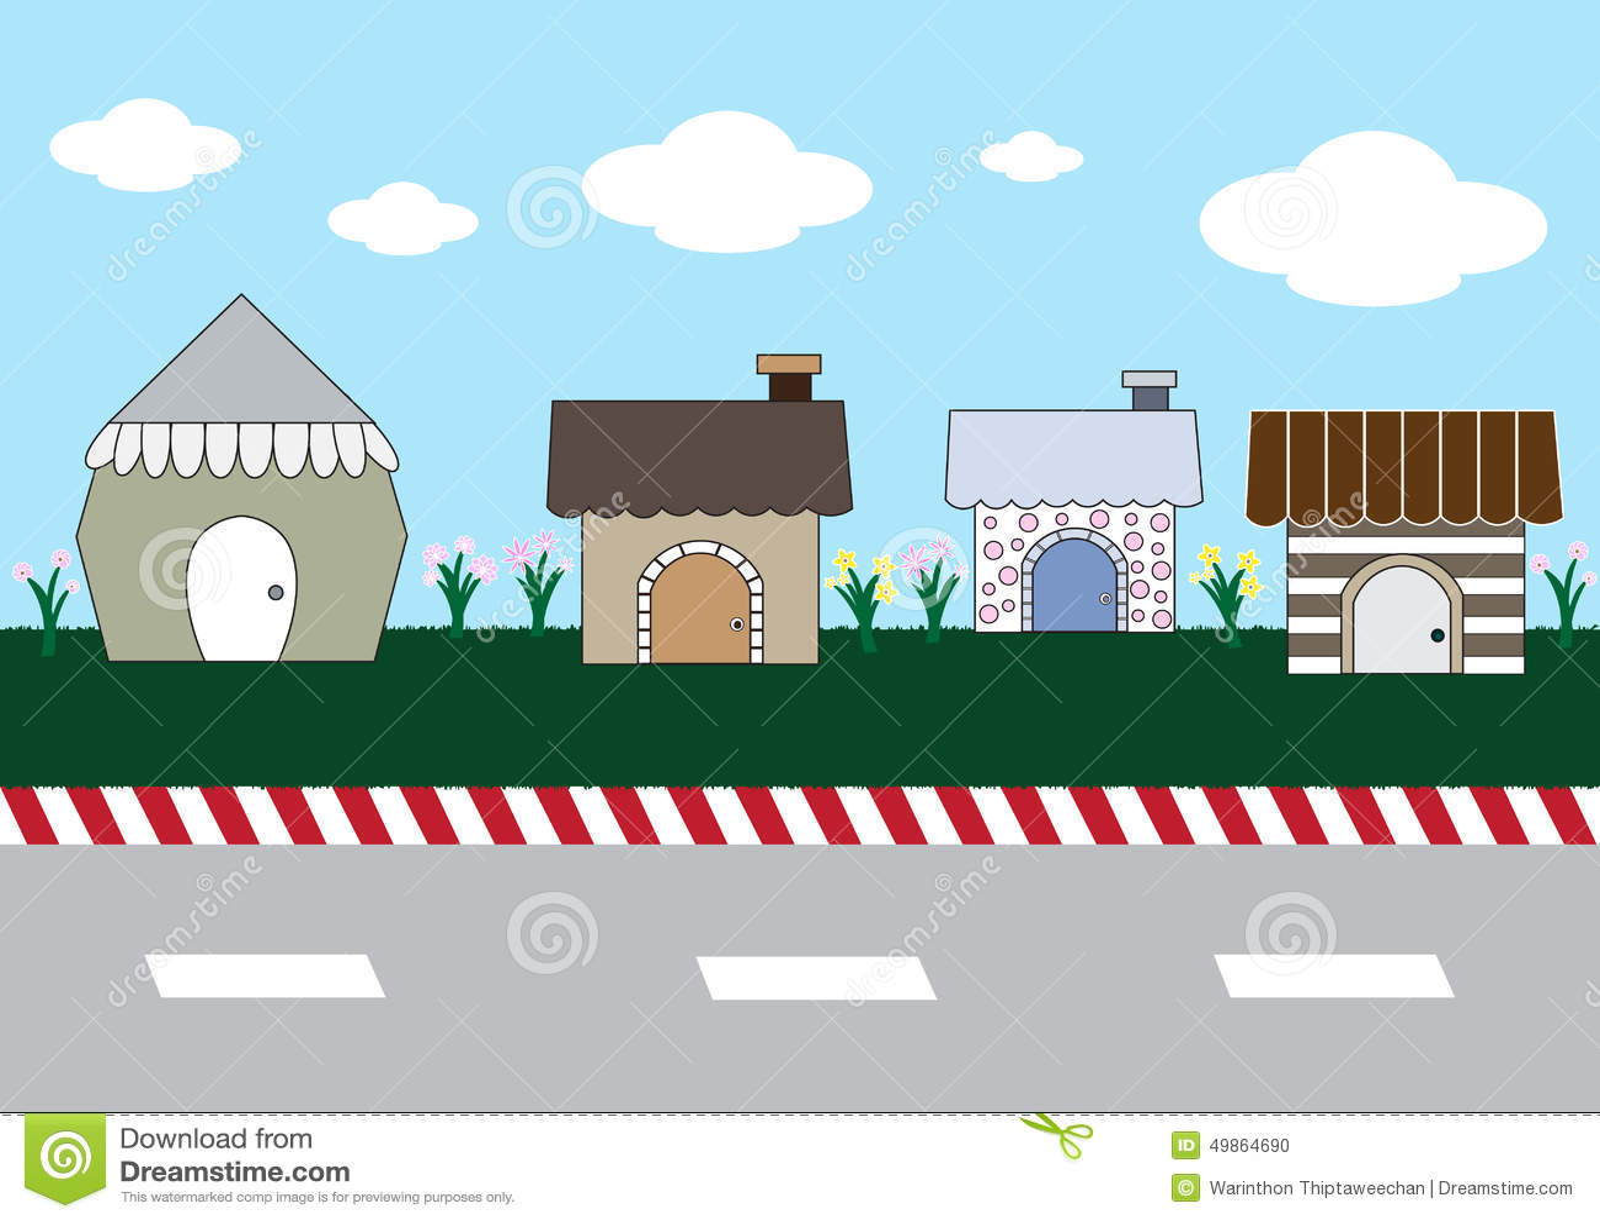 Cute Cartoon Homes On Street Stock Vector - Image: 49864690